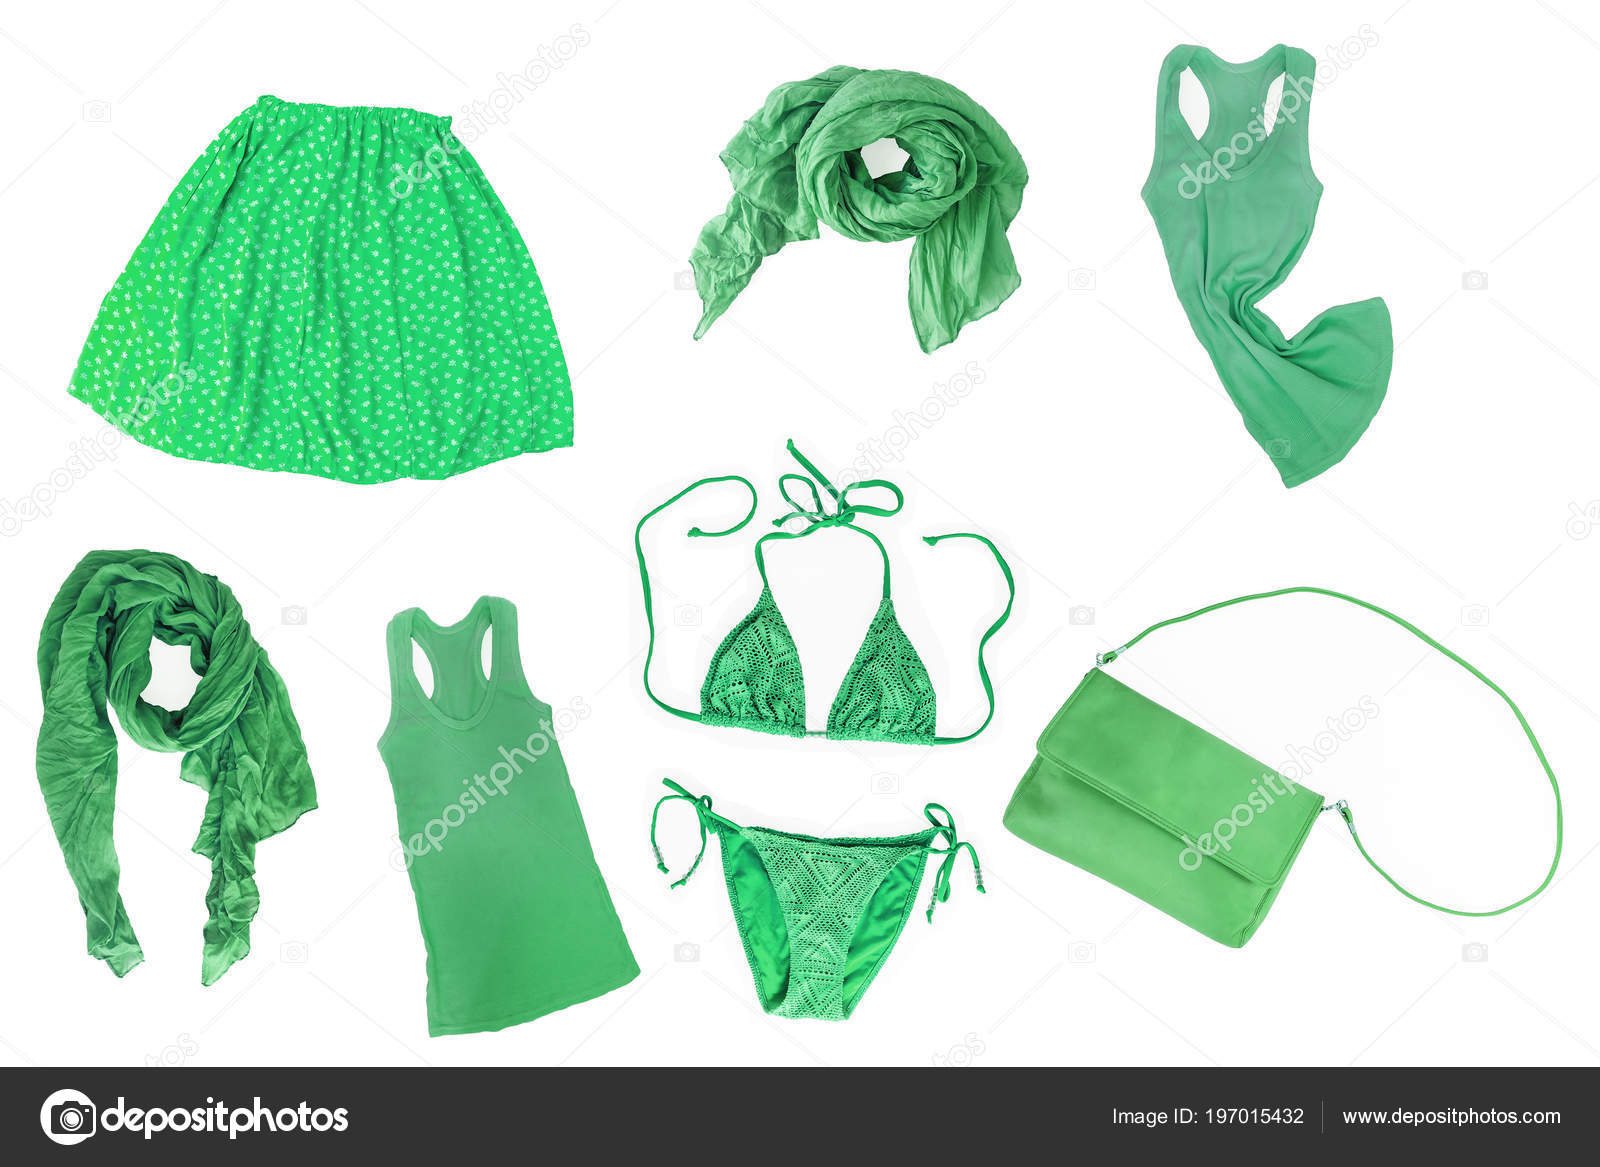 c1063cd7dec Κολάζ Μόδας Πράσινο Καλοκαίρι Άνοιξη Γυναικεία Ρούχα Και Αξεσουάρ ...